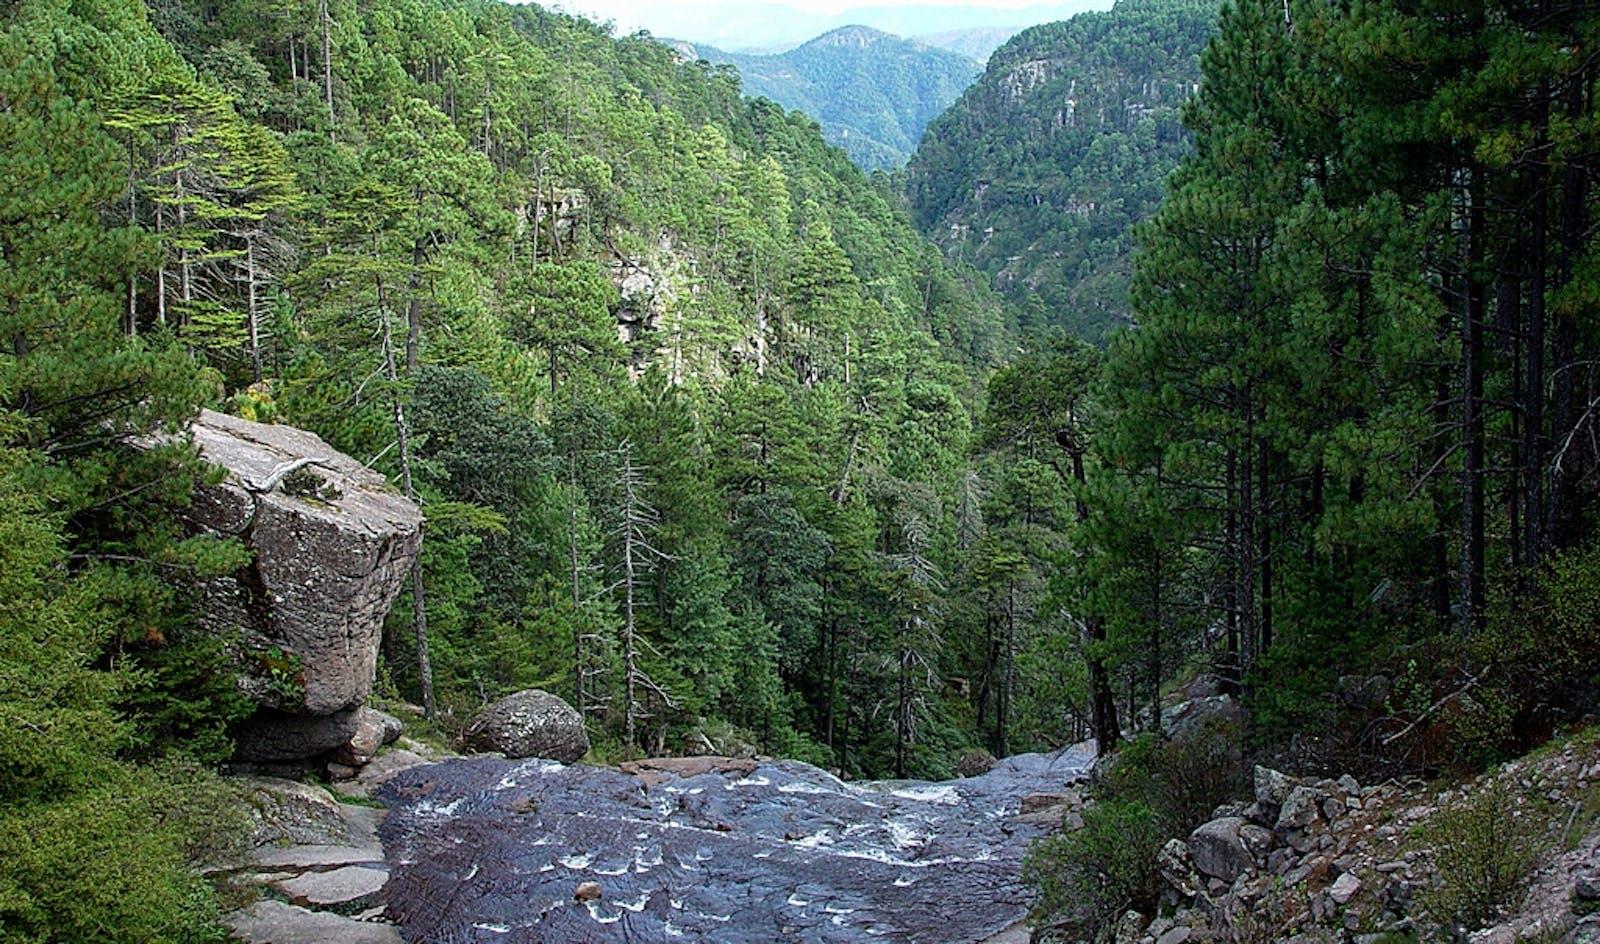 Sierra Madre Occidental Pine-Oak Forests